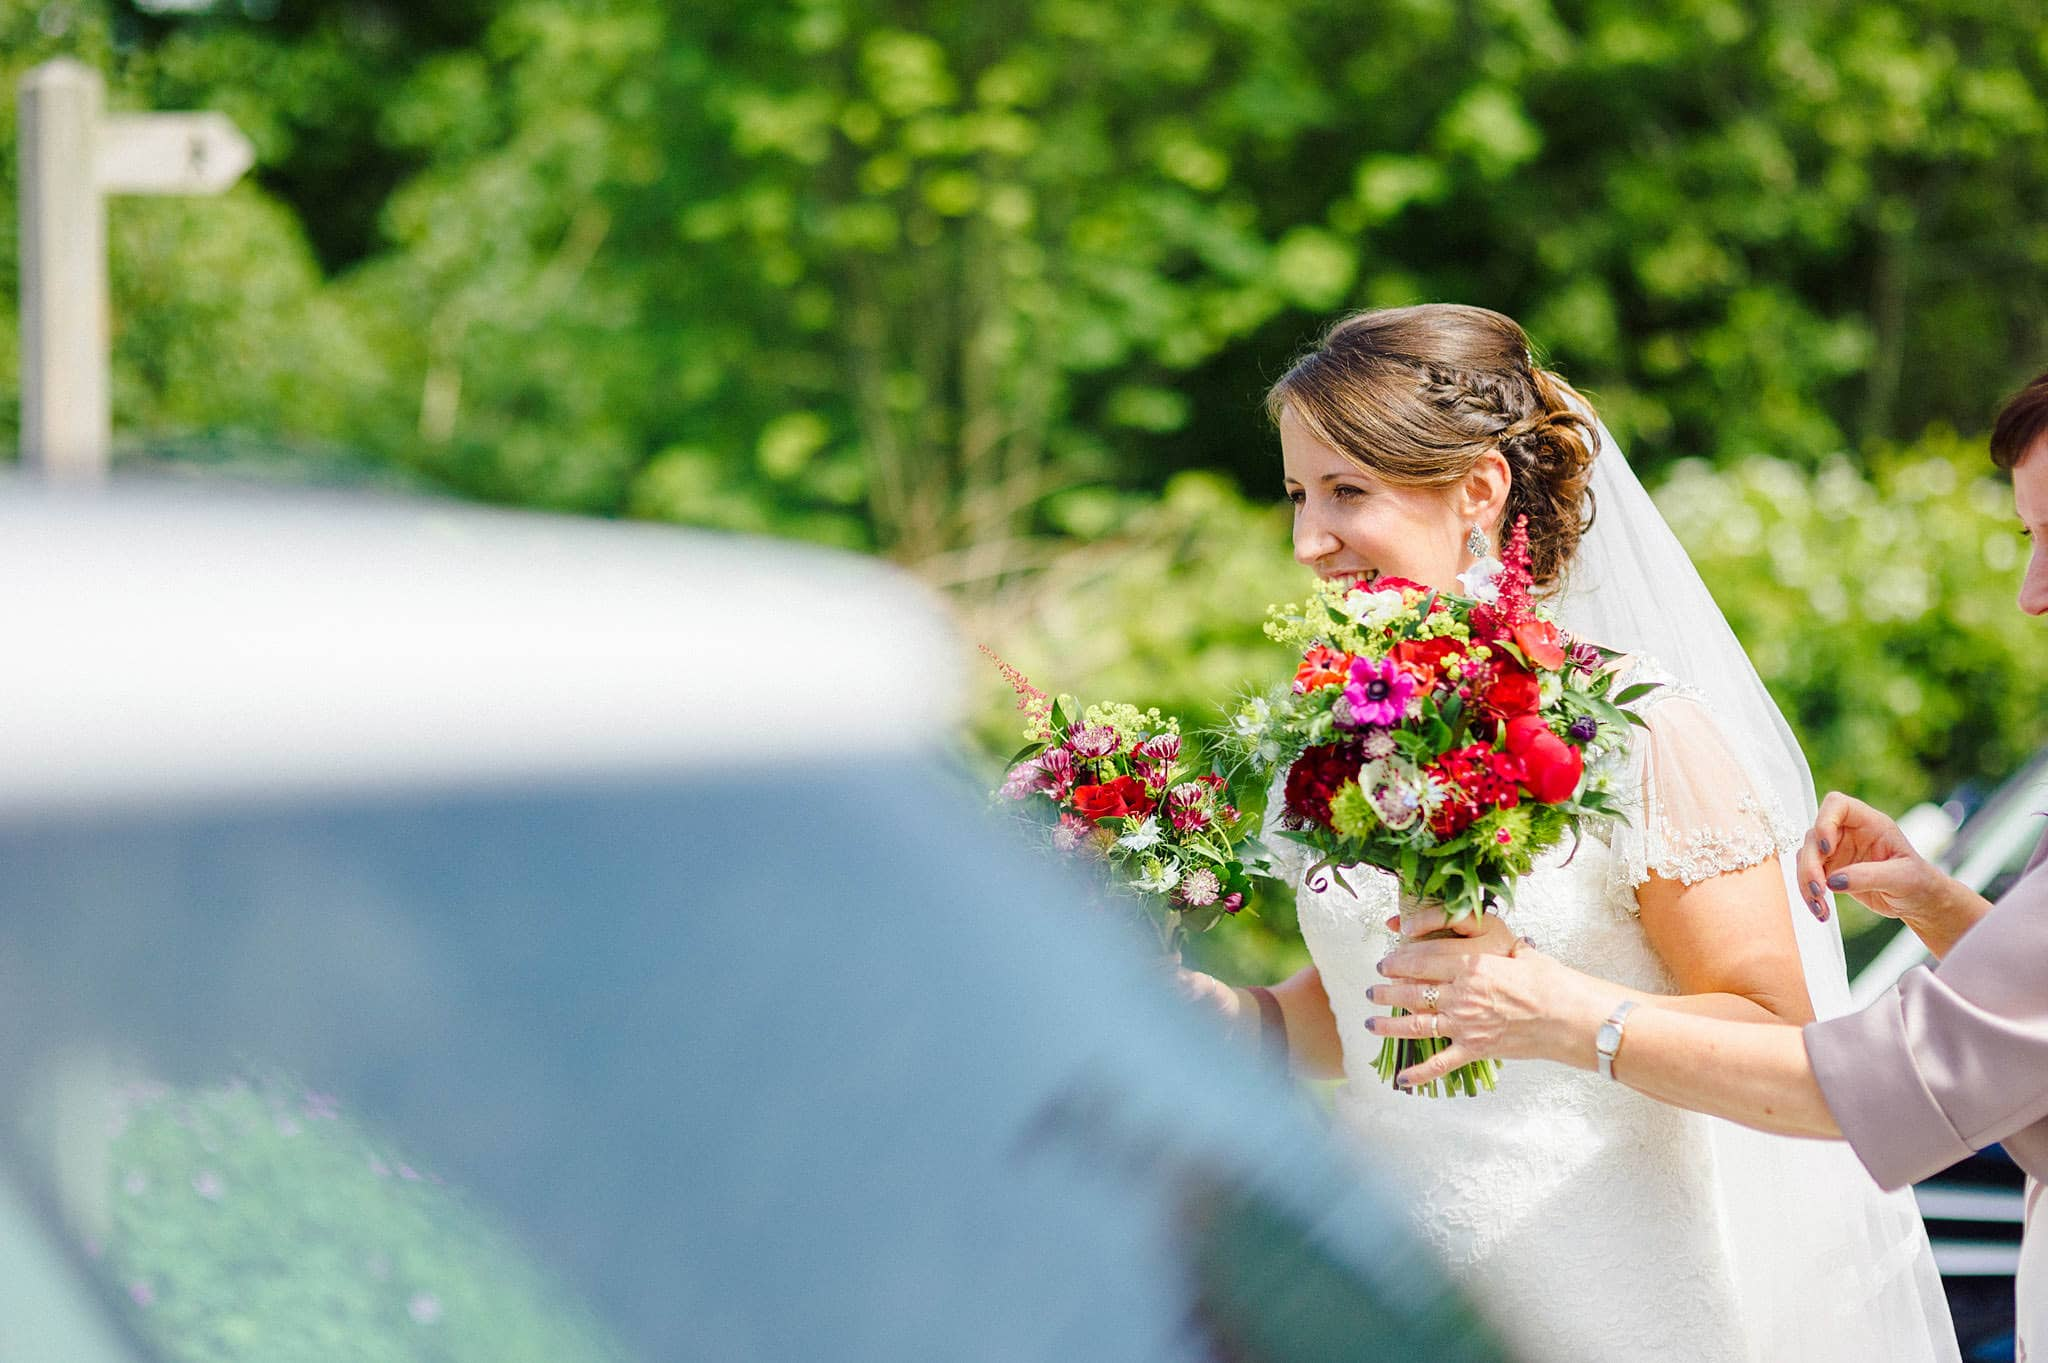 wedding-photographer-aberystwyth-wales (25)